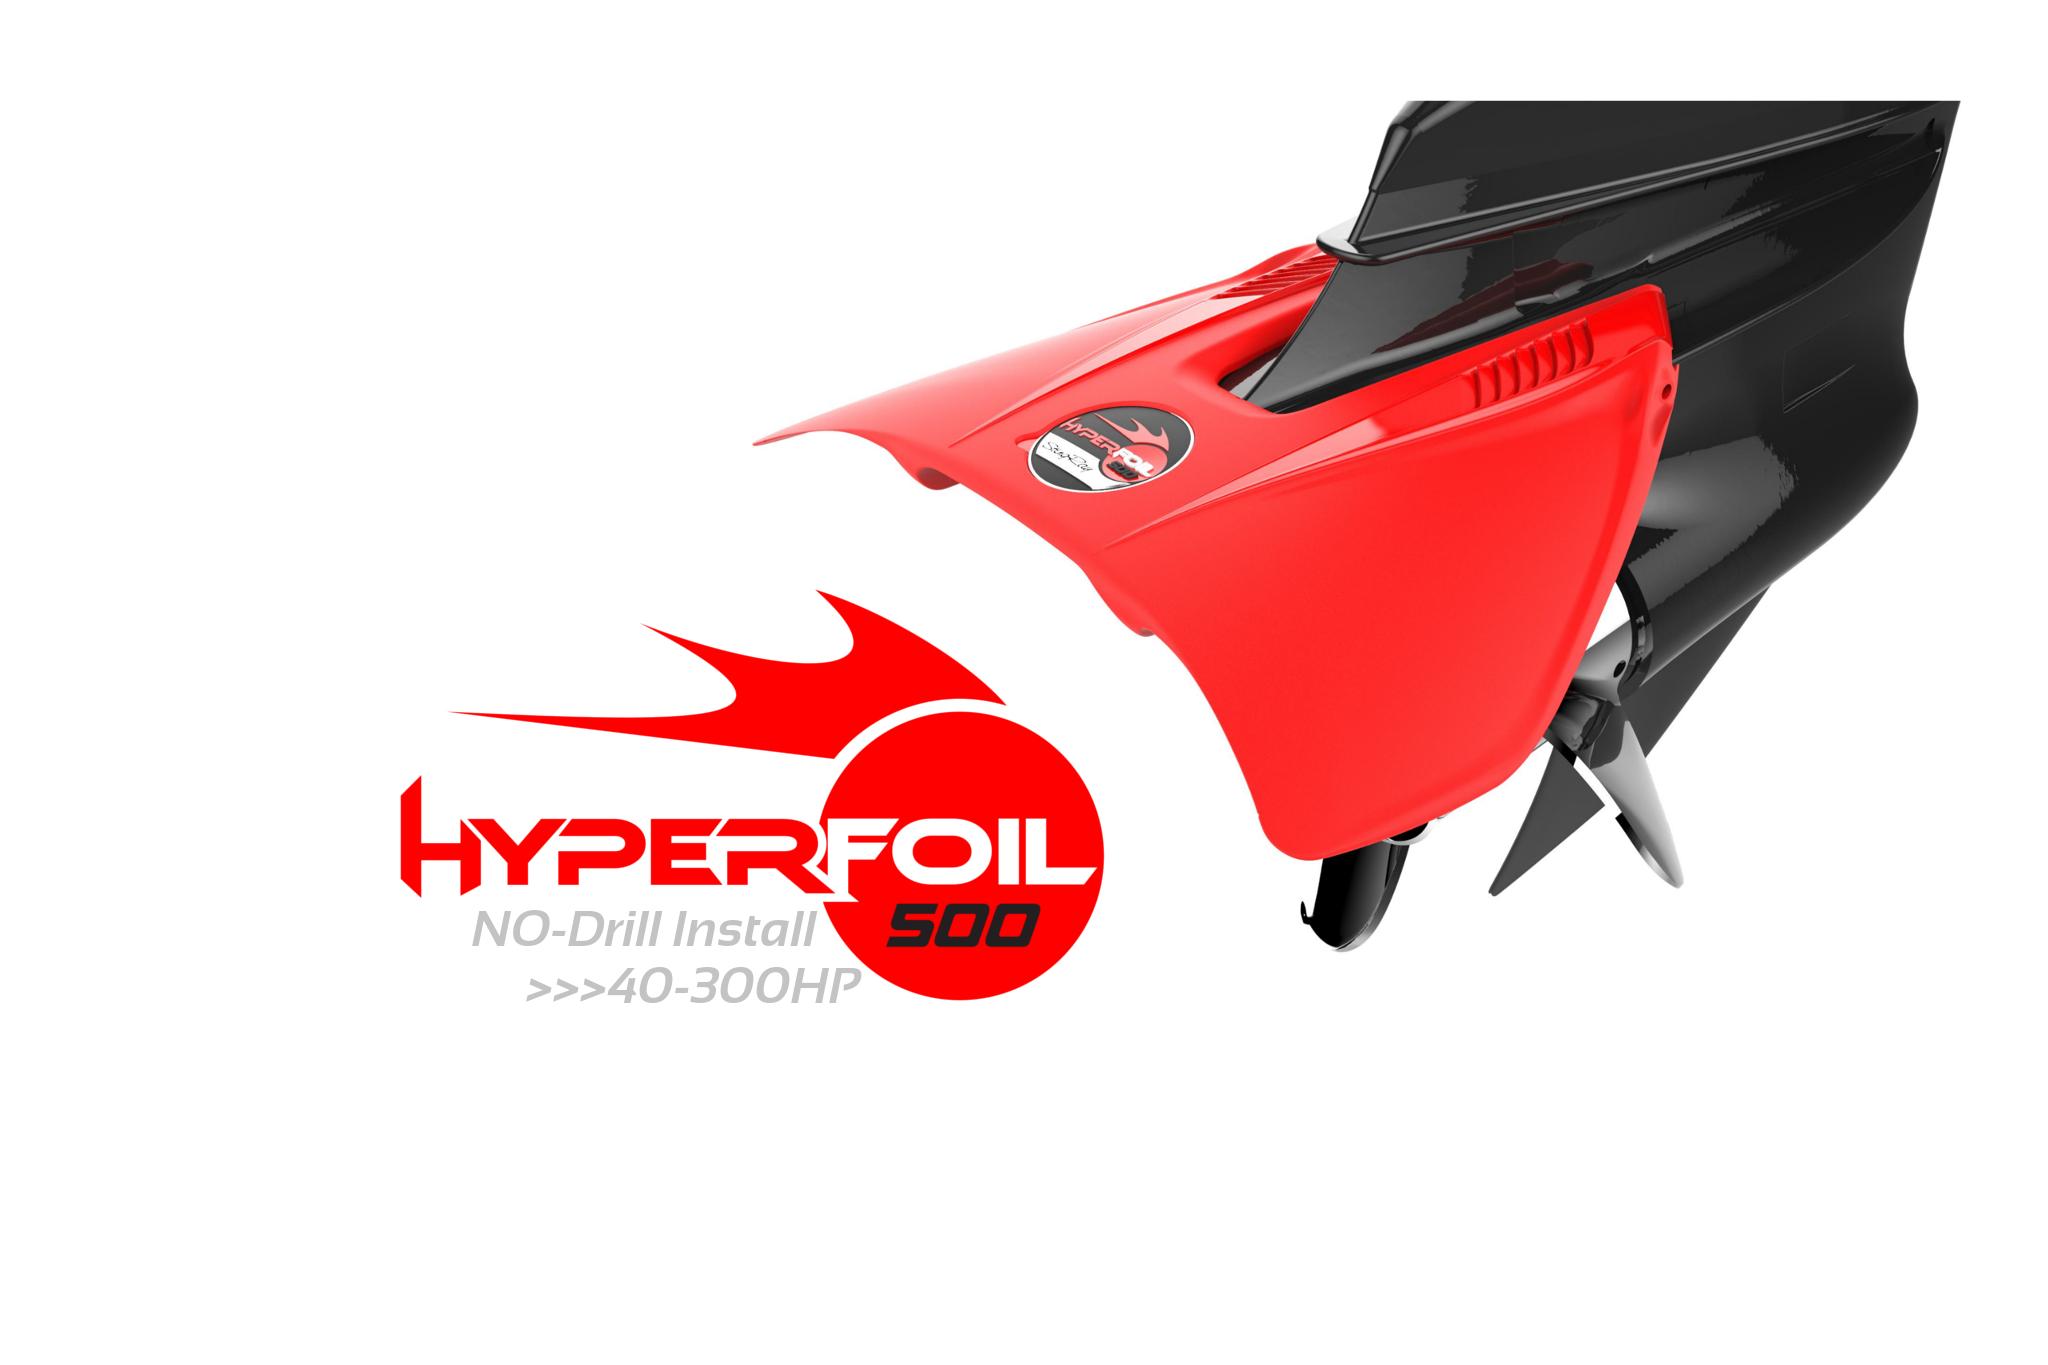 HyperFoilGalleryFINAL.jpg